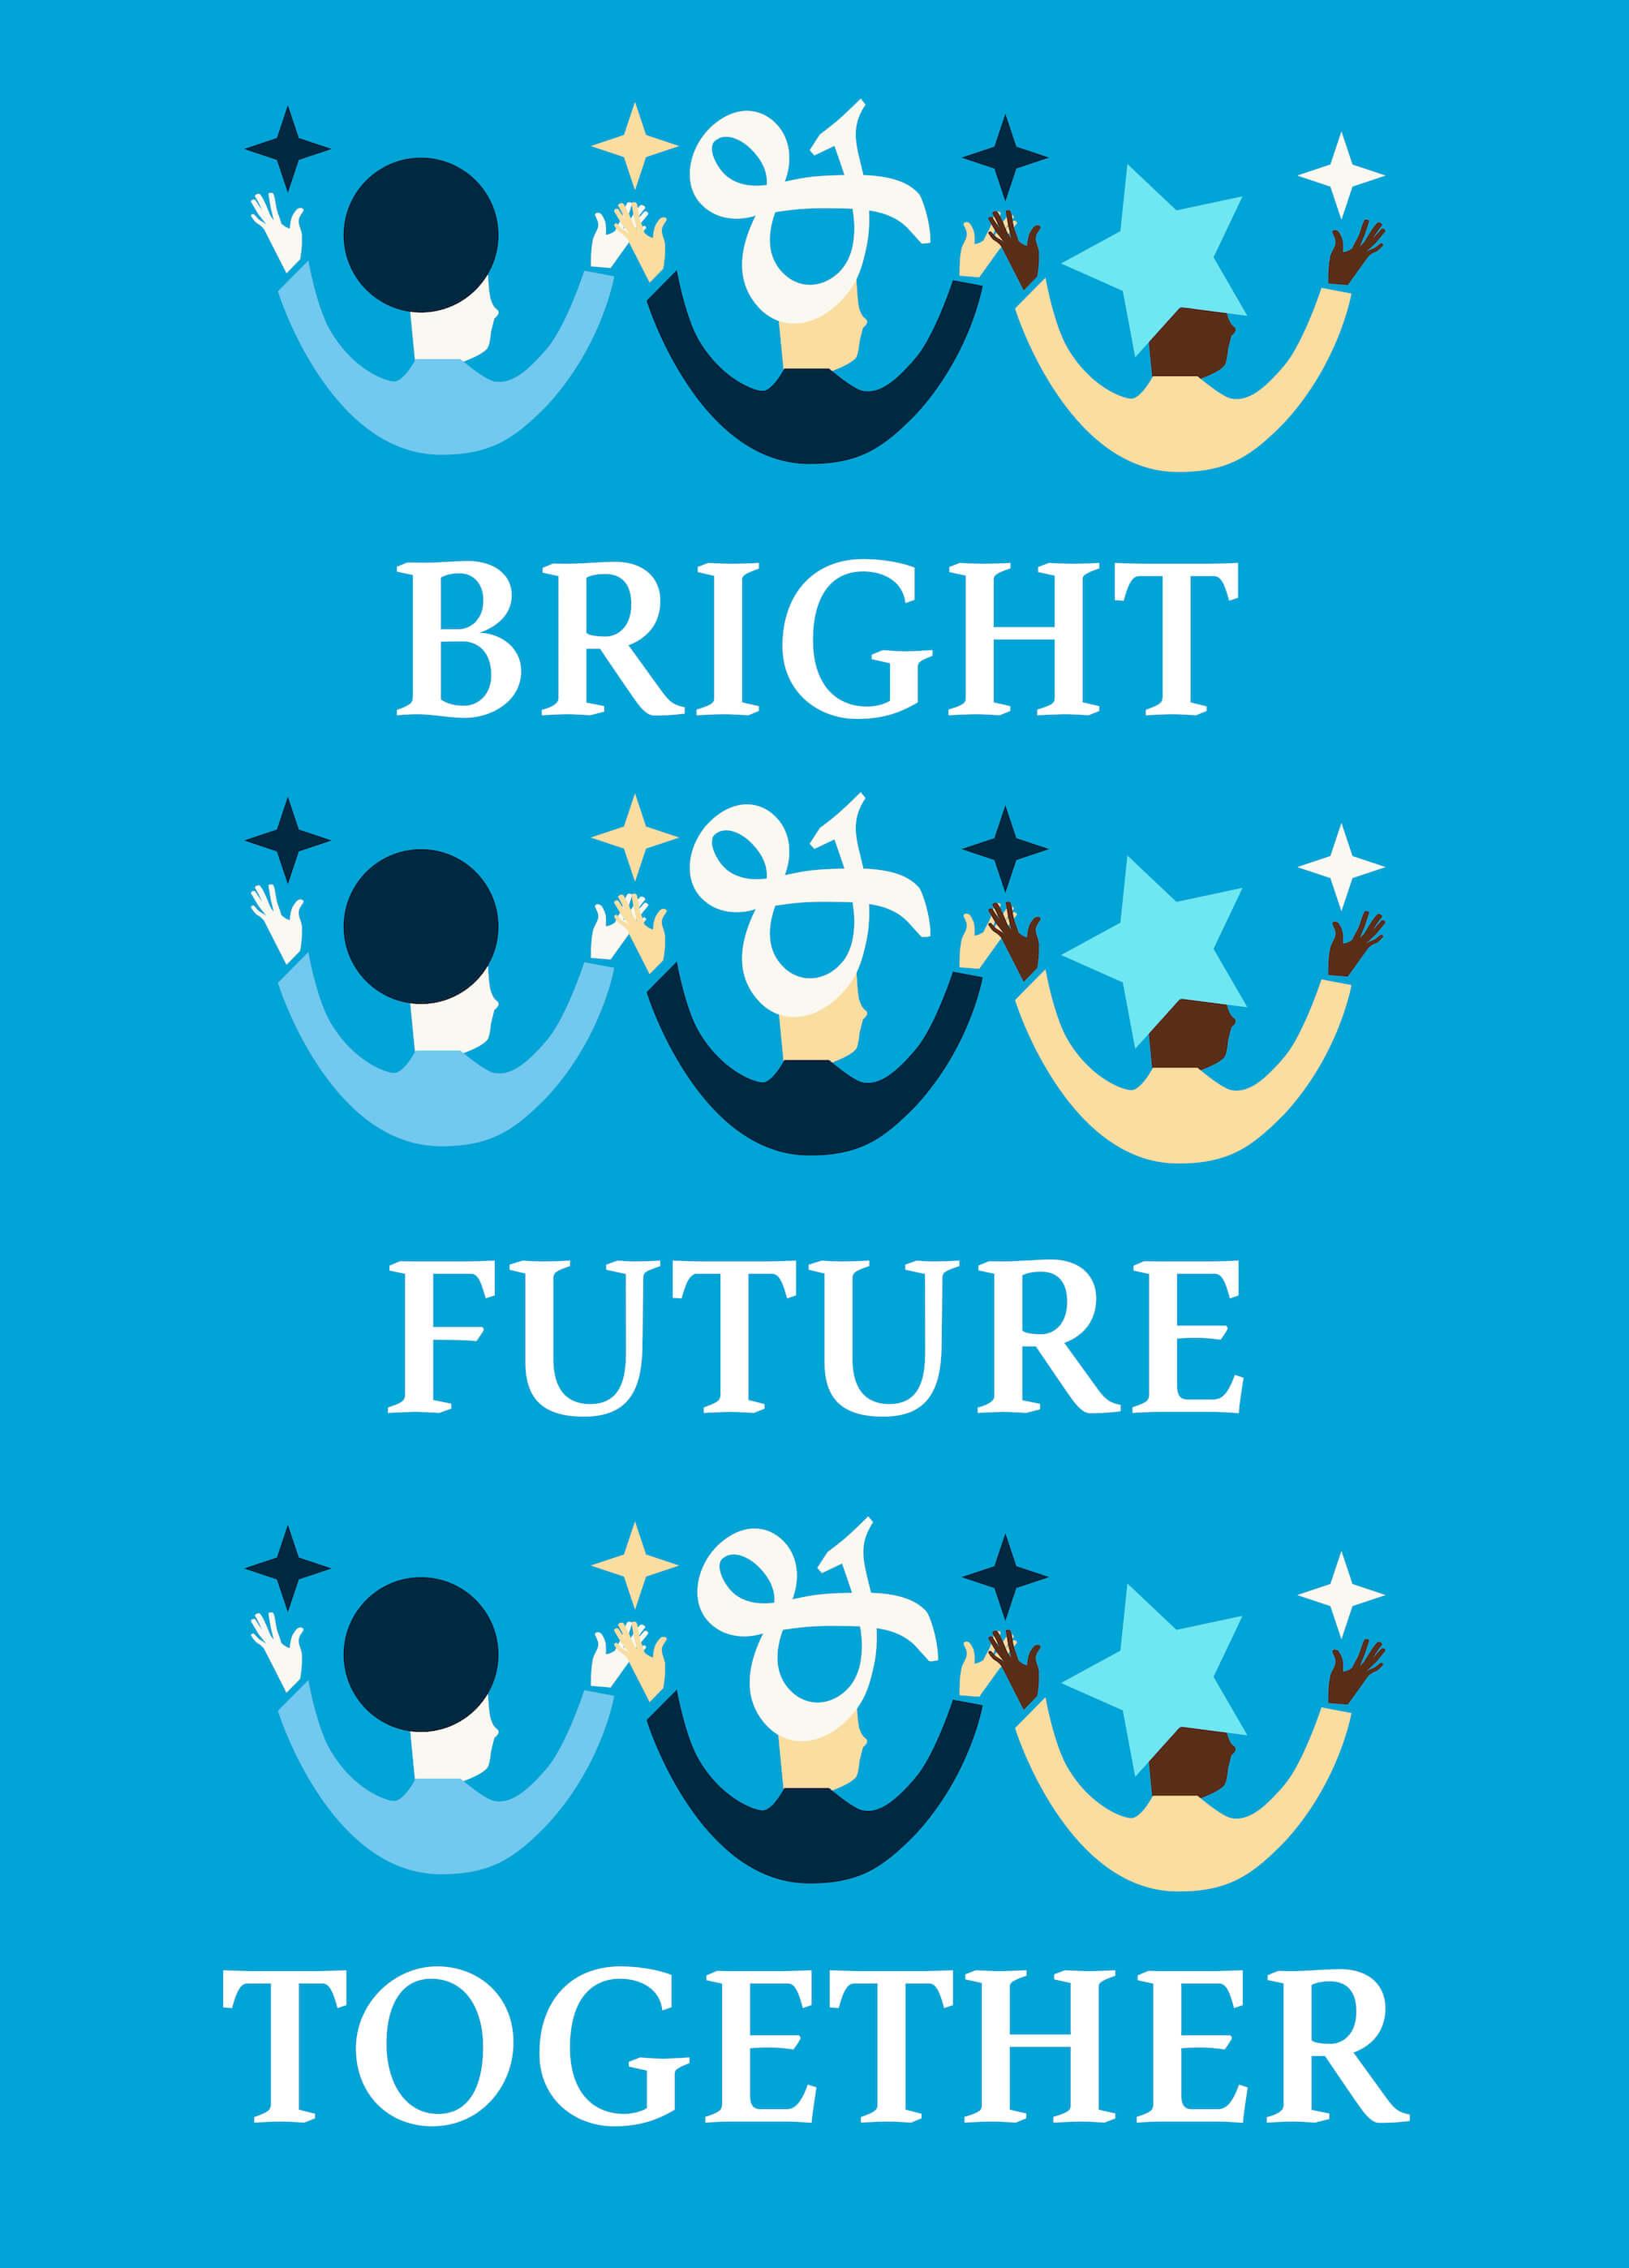 Bright Future Together main image